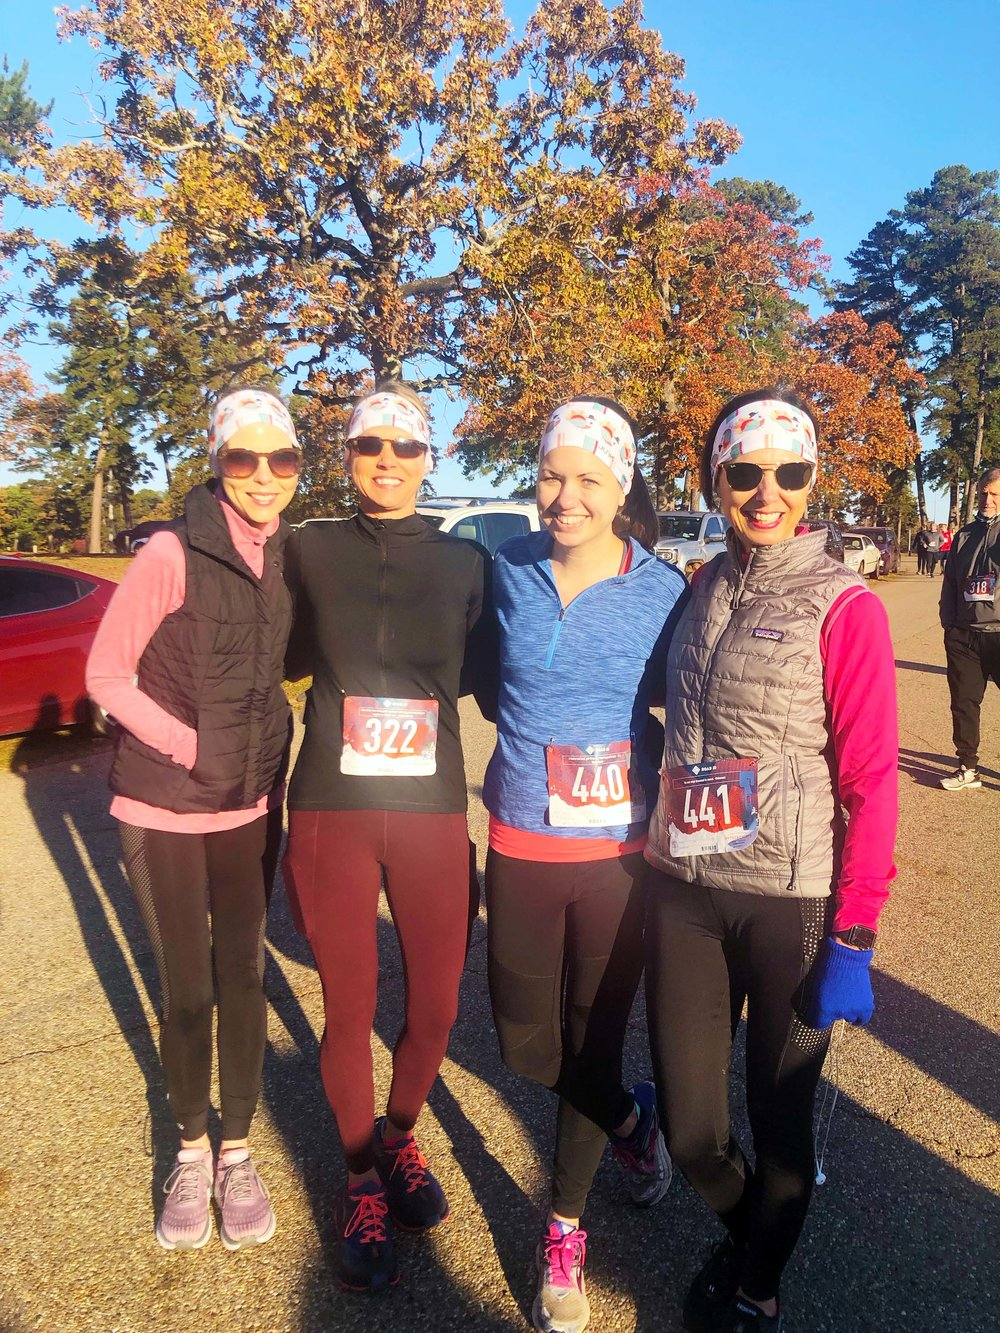 Kimberly Davis, Tresa Cox, Sarah Vammen and Melinda Vammen